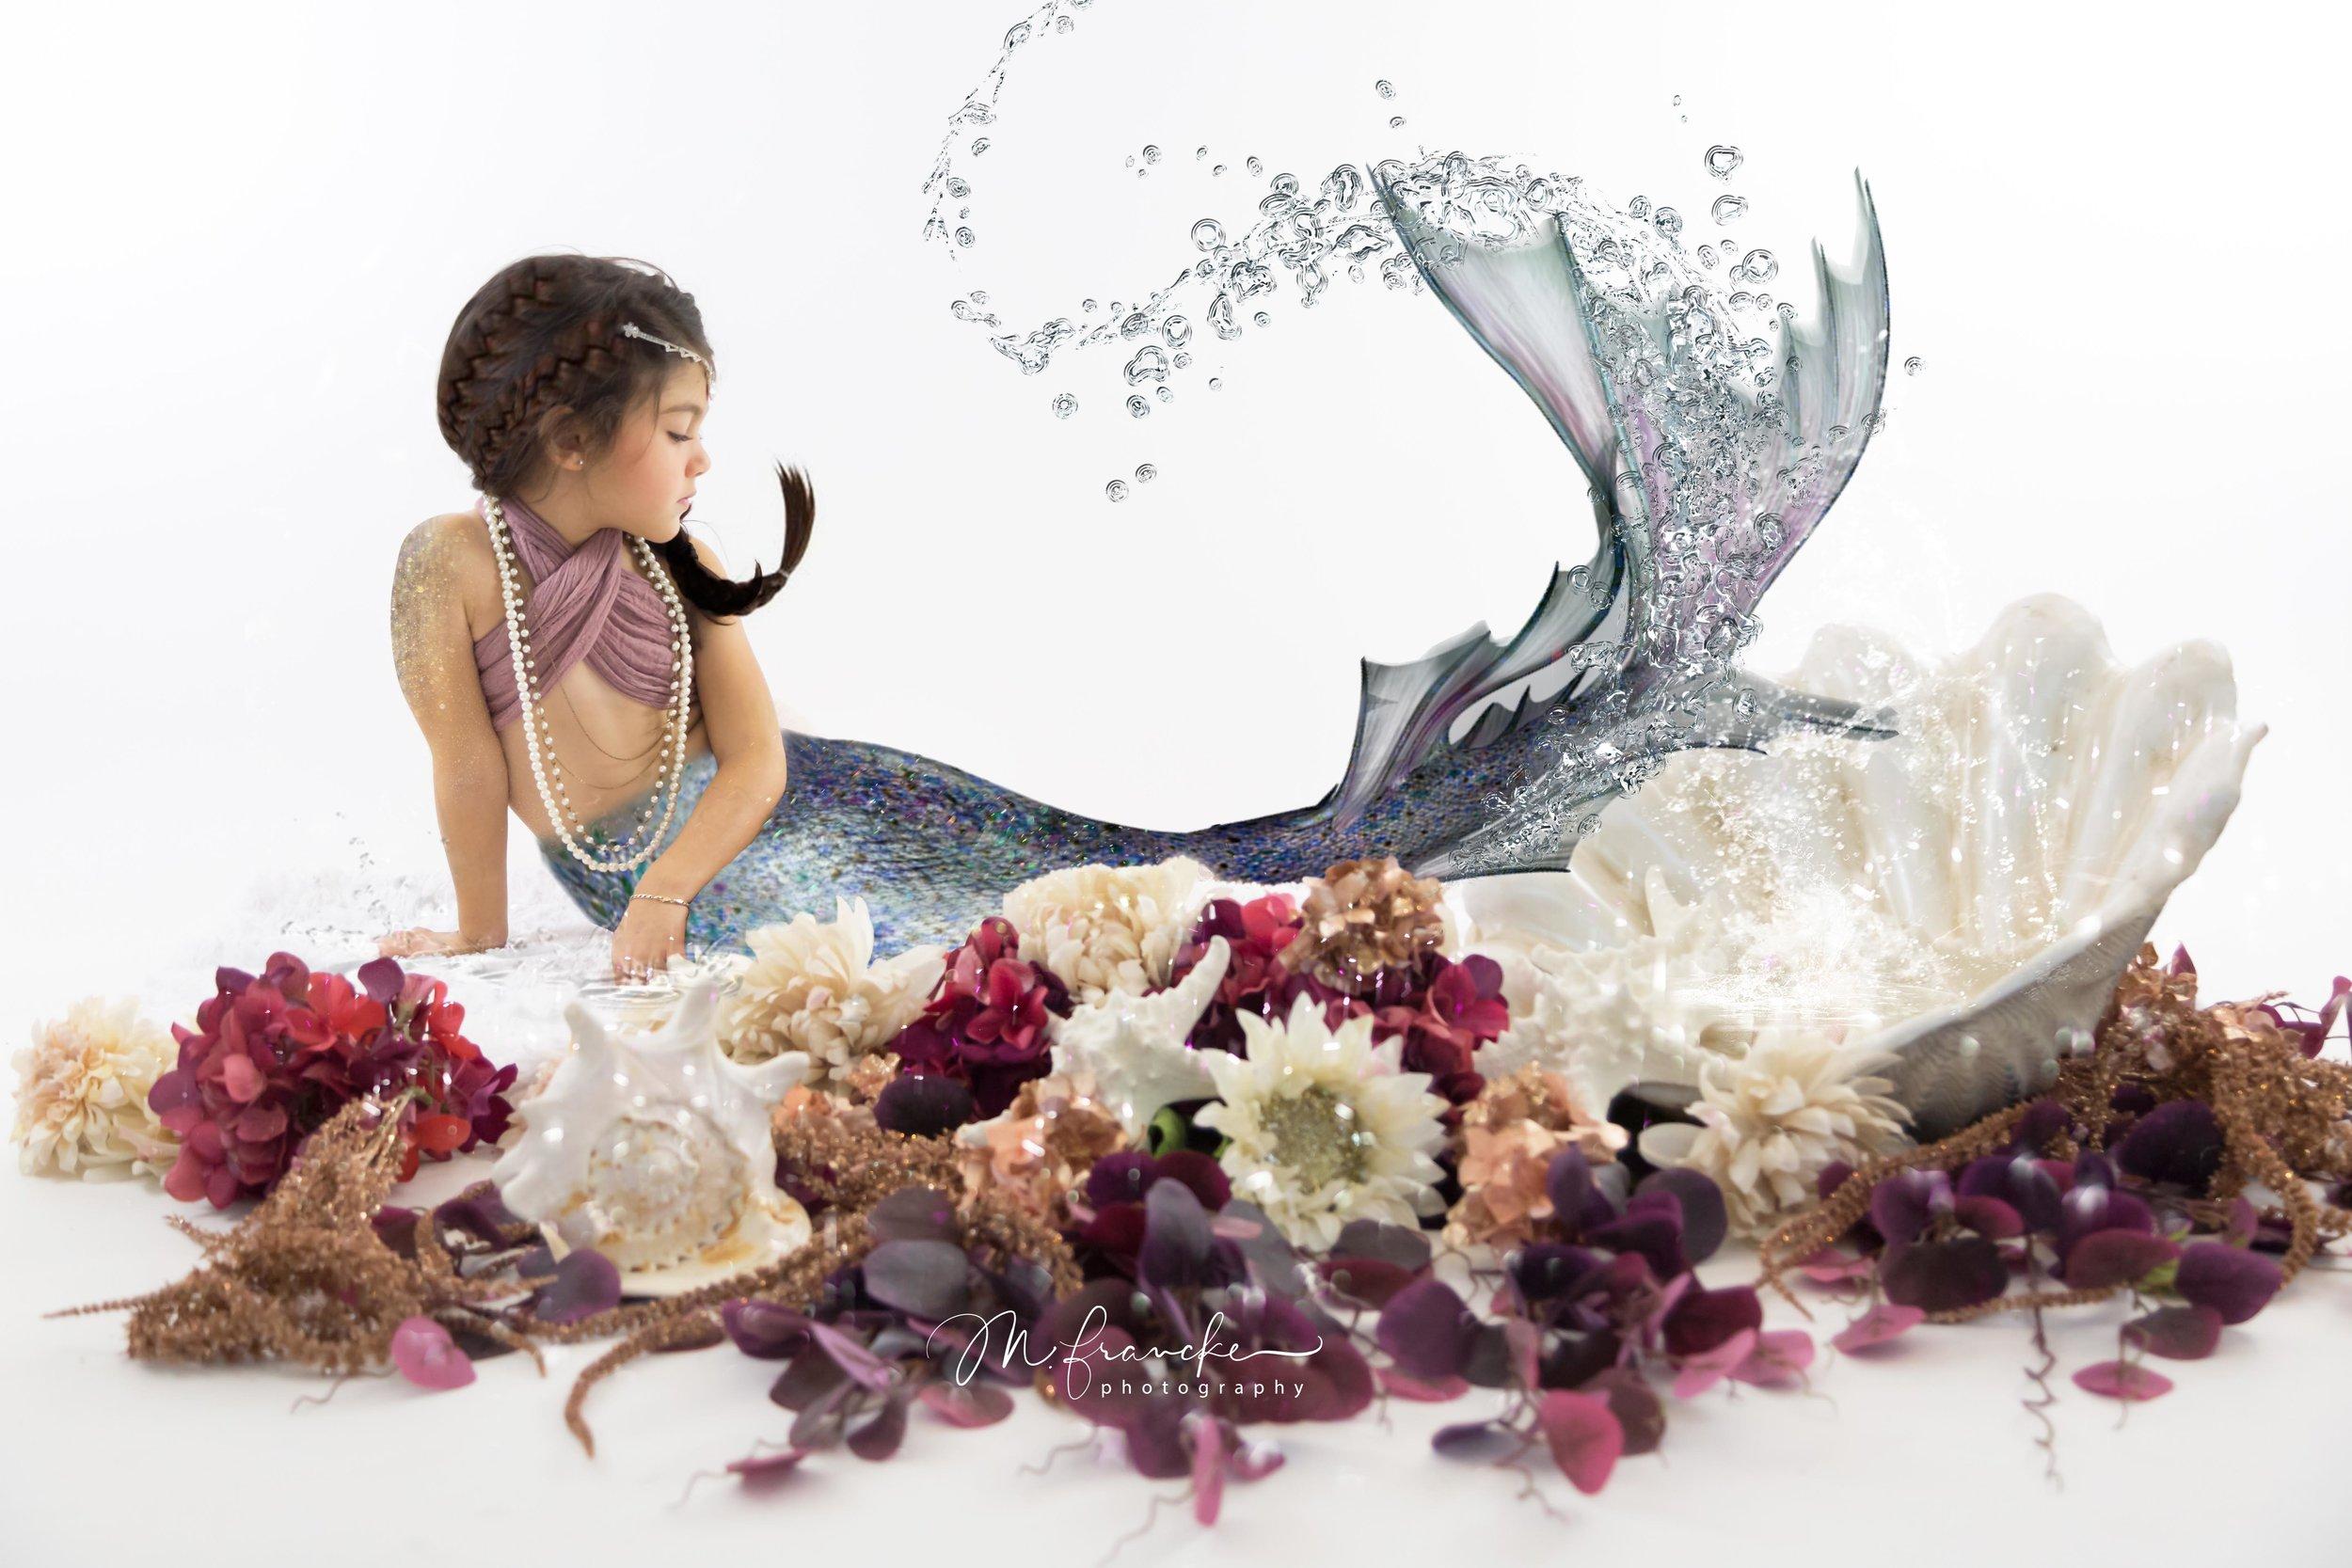 lr-Briella Mermaid-20.jpg